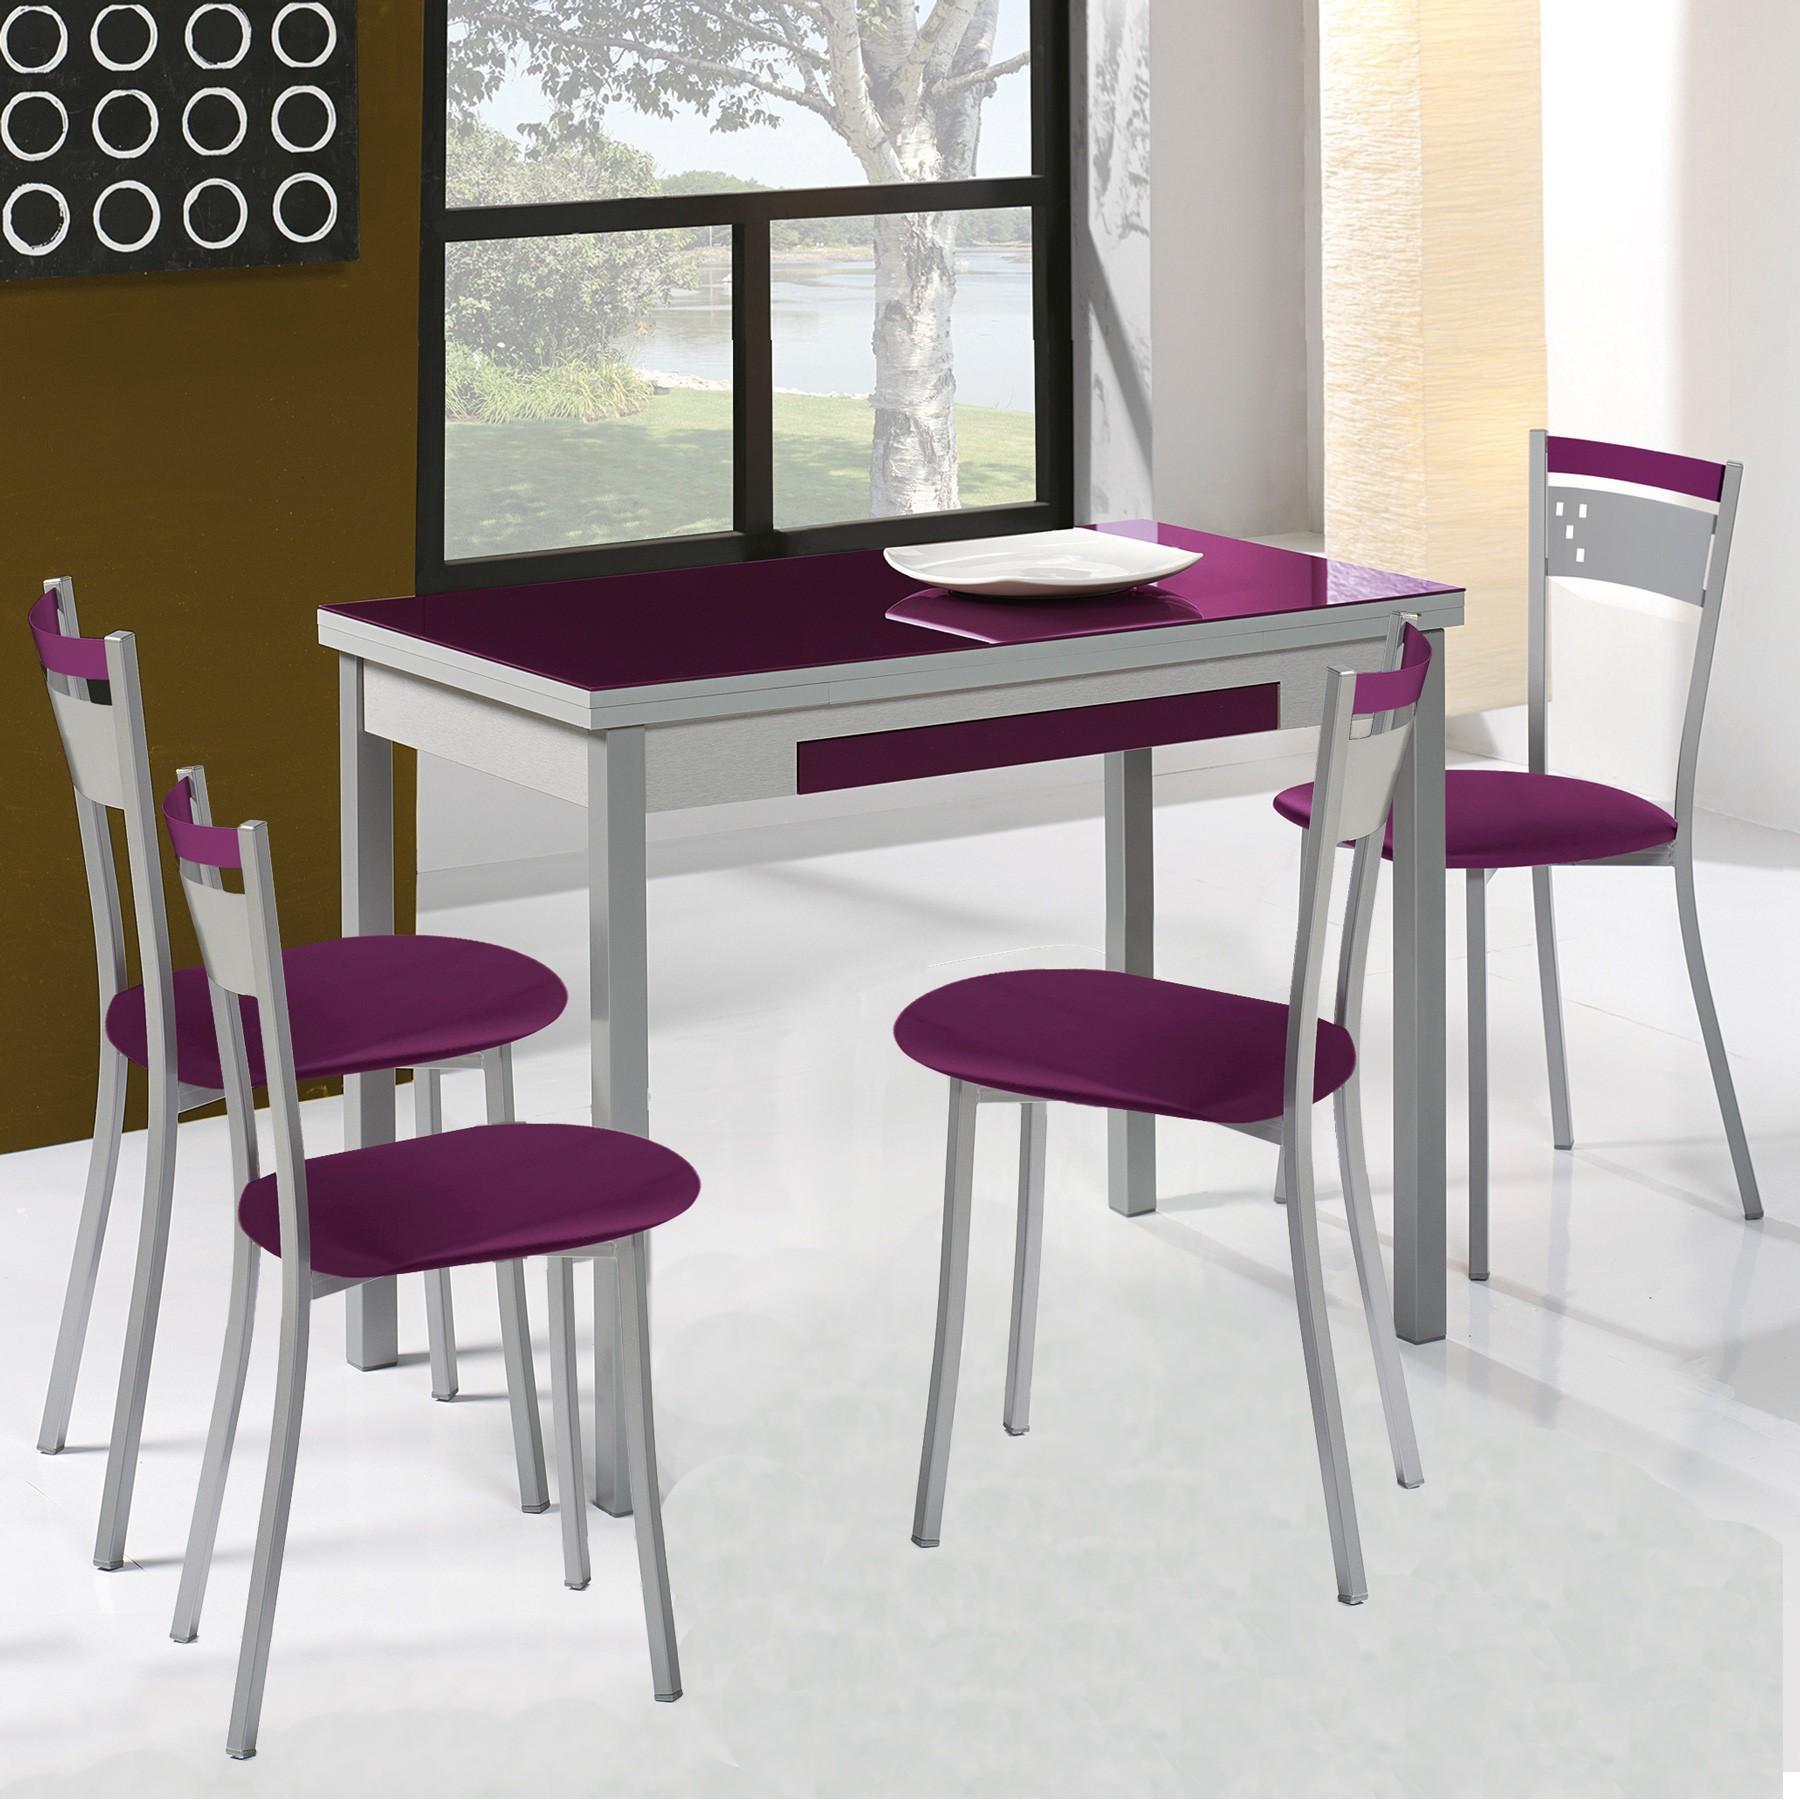 Pack mesa de cocina extensible y 4 sillas mod a - Mesas de cocina abatibles ...